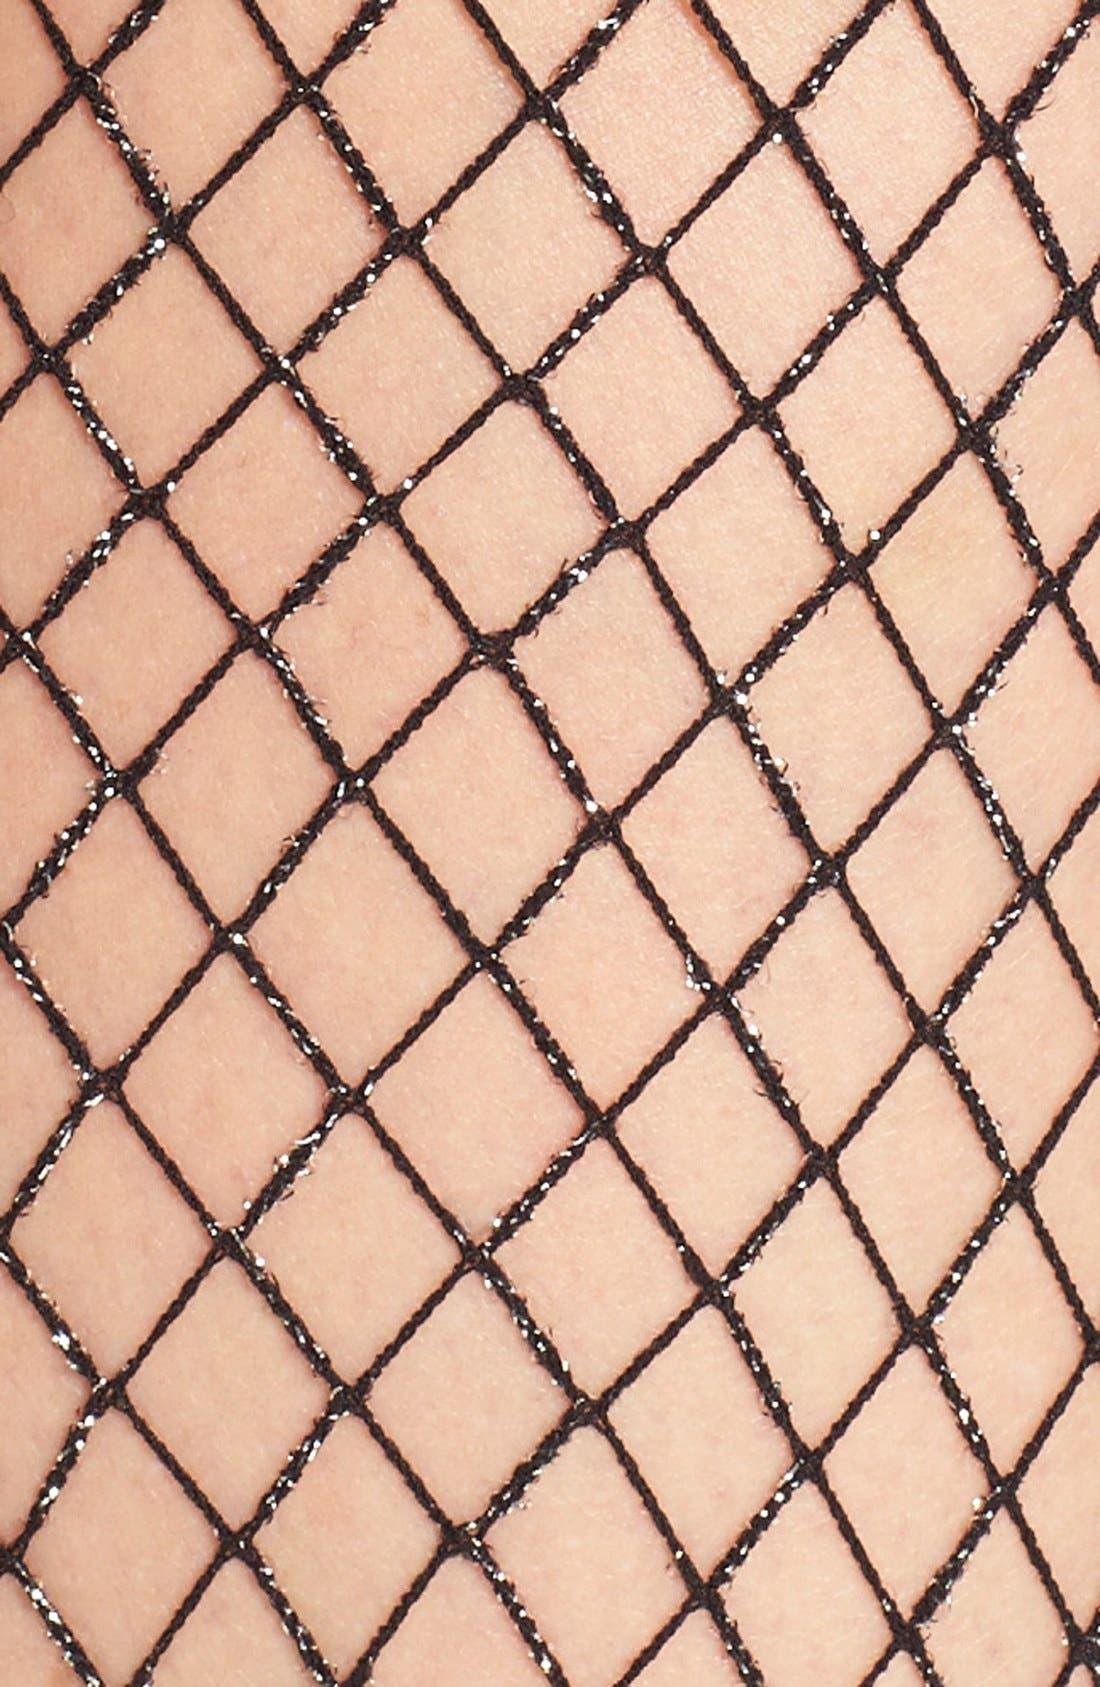 Oversize Metallic Fishnet Tights,                             Alternate thumbnail 2, color,                             001